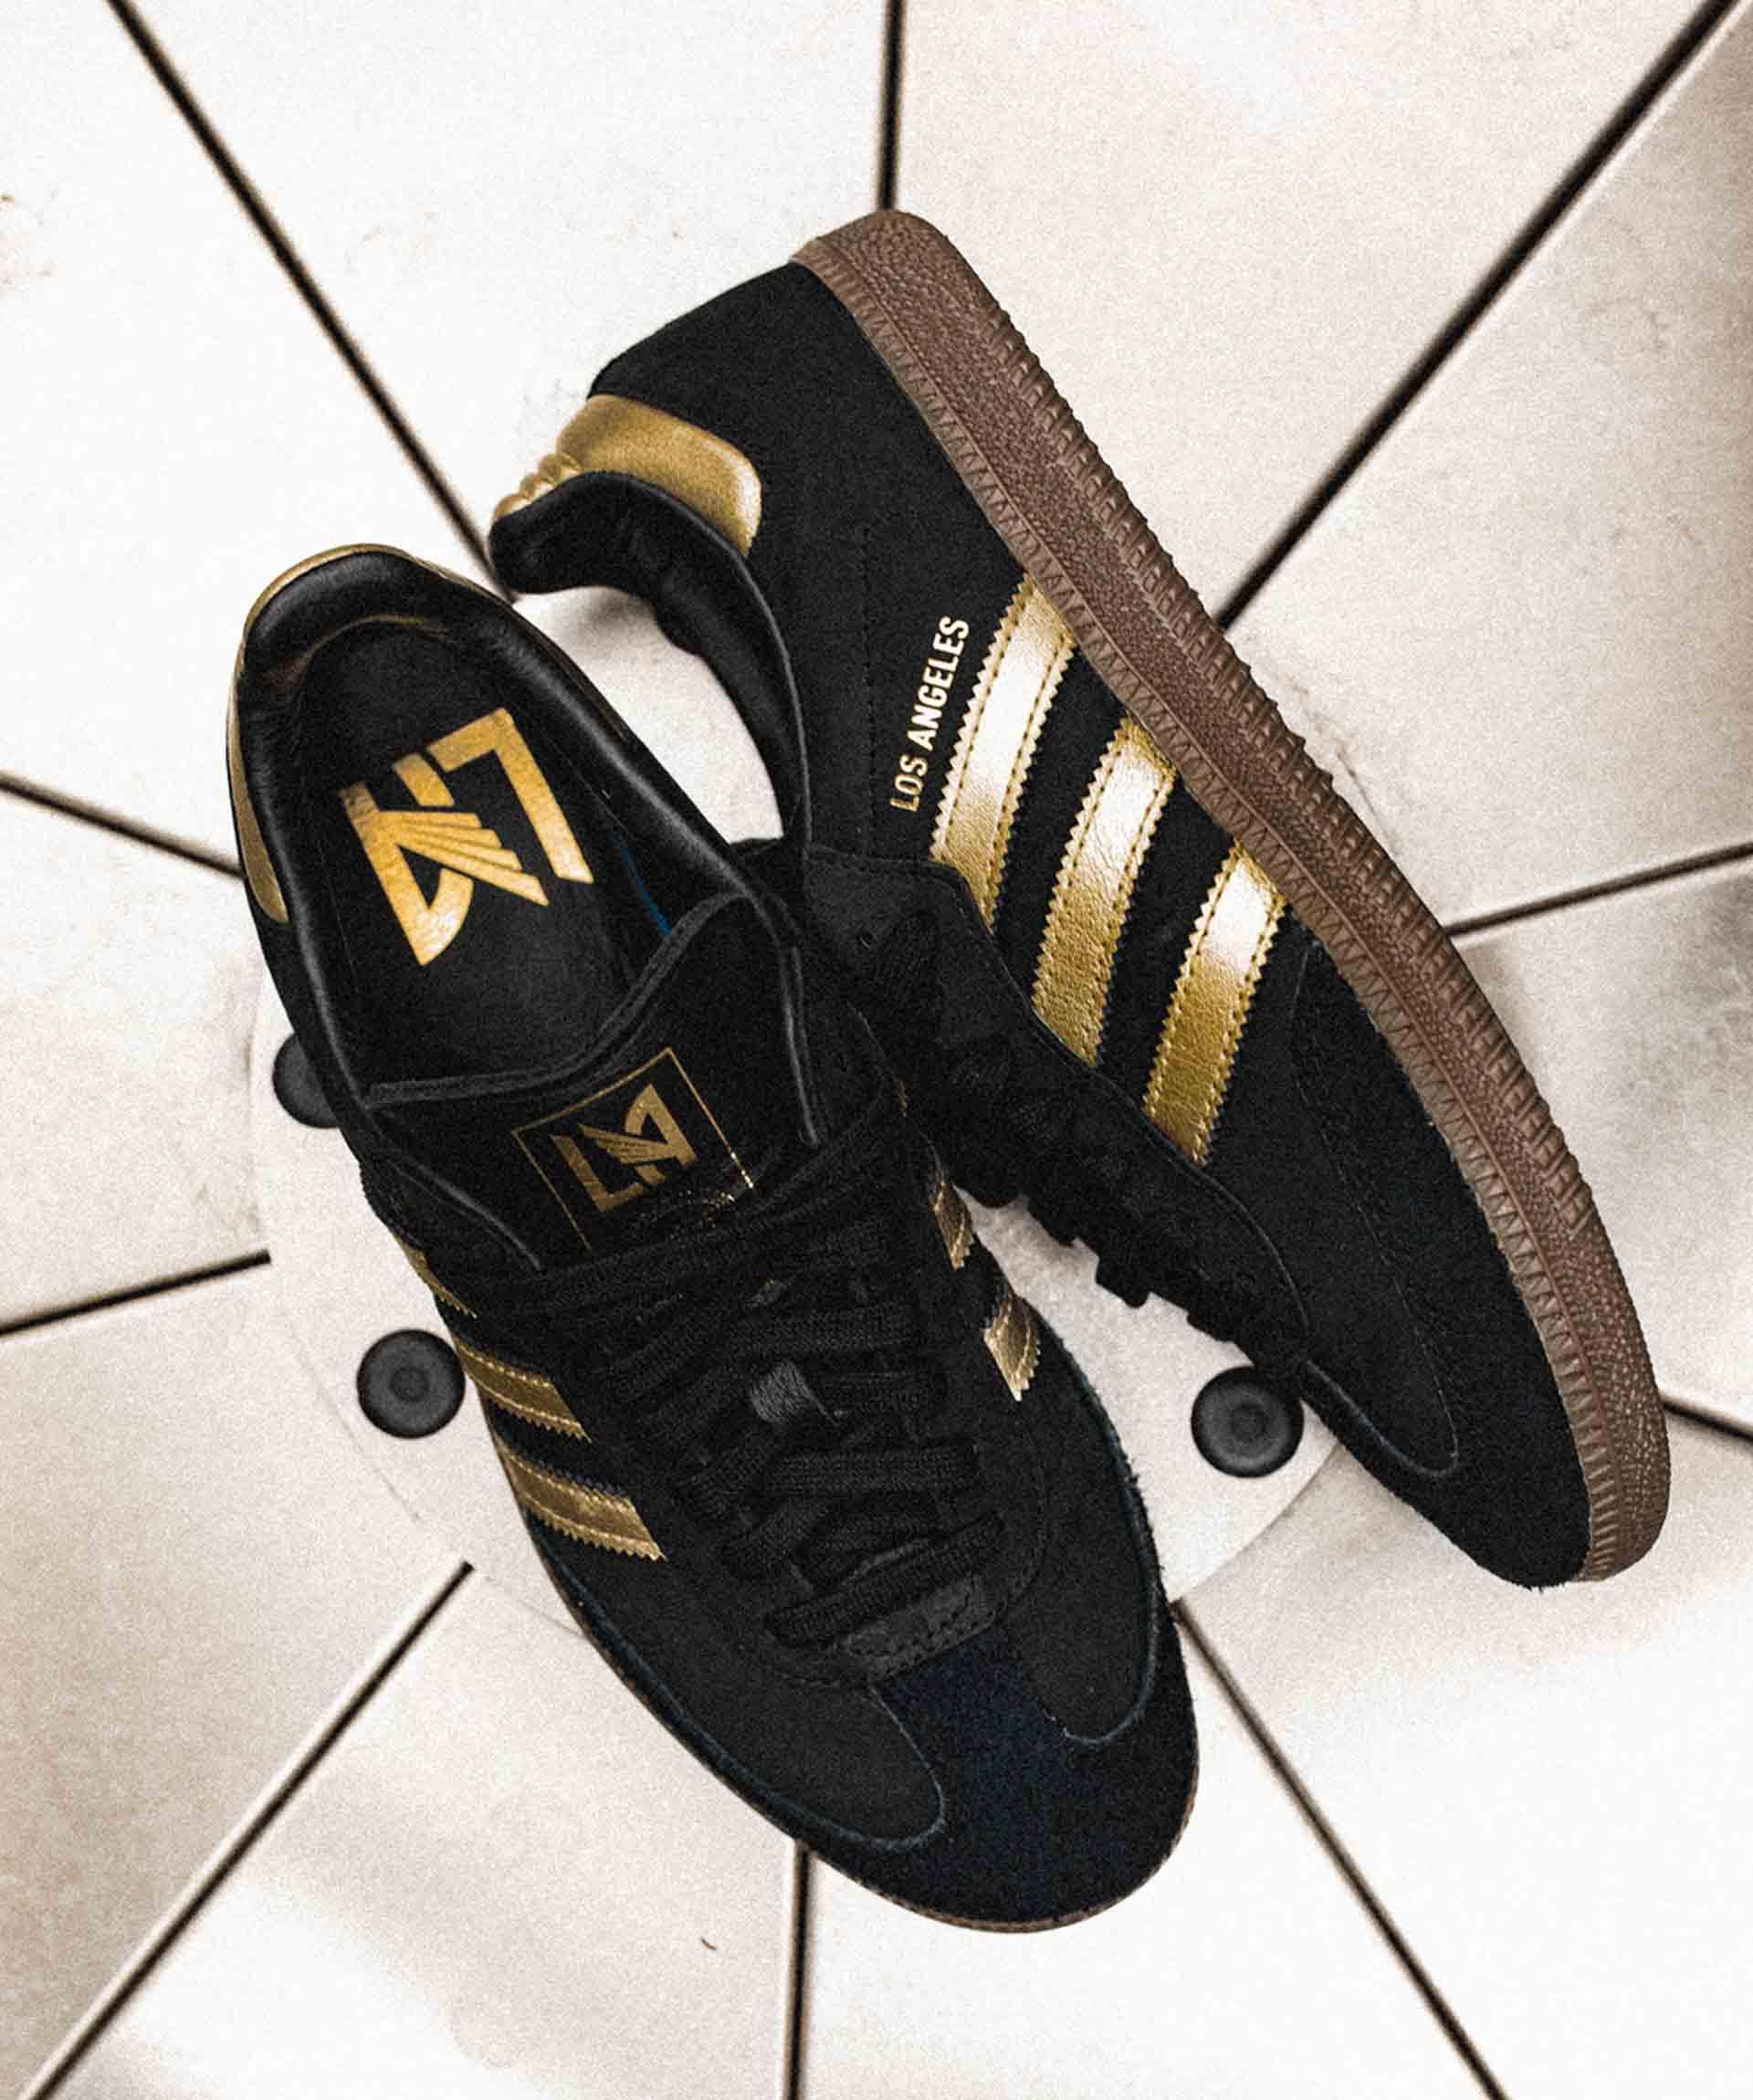 LAFC \u0026 adidas Originals Reveal Two